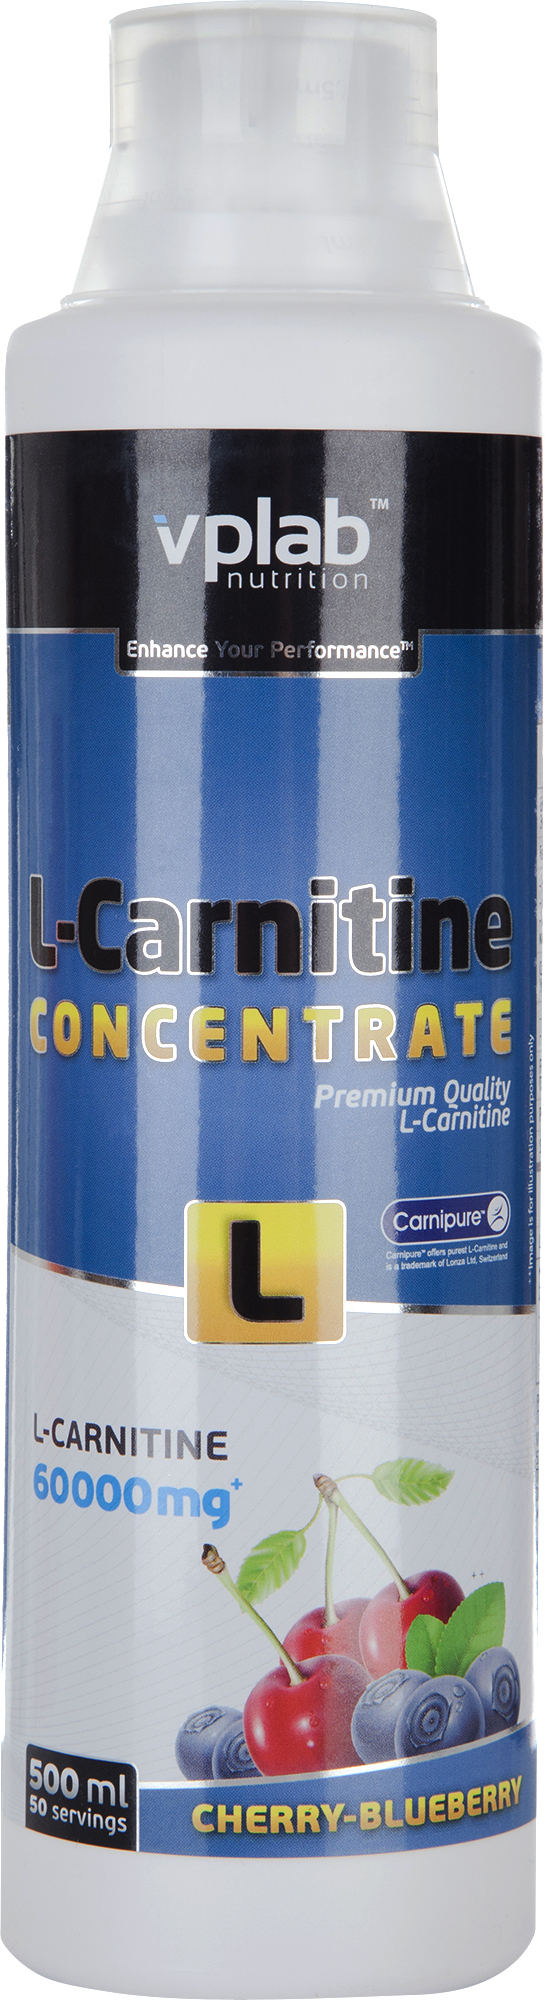 Vplab nutrition Л-карнитин nutrition, вишня и черника